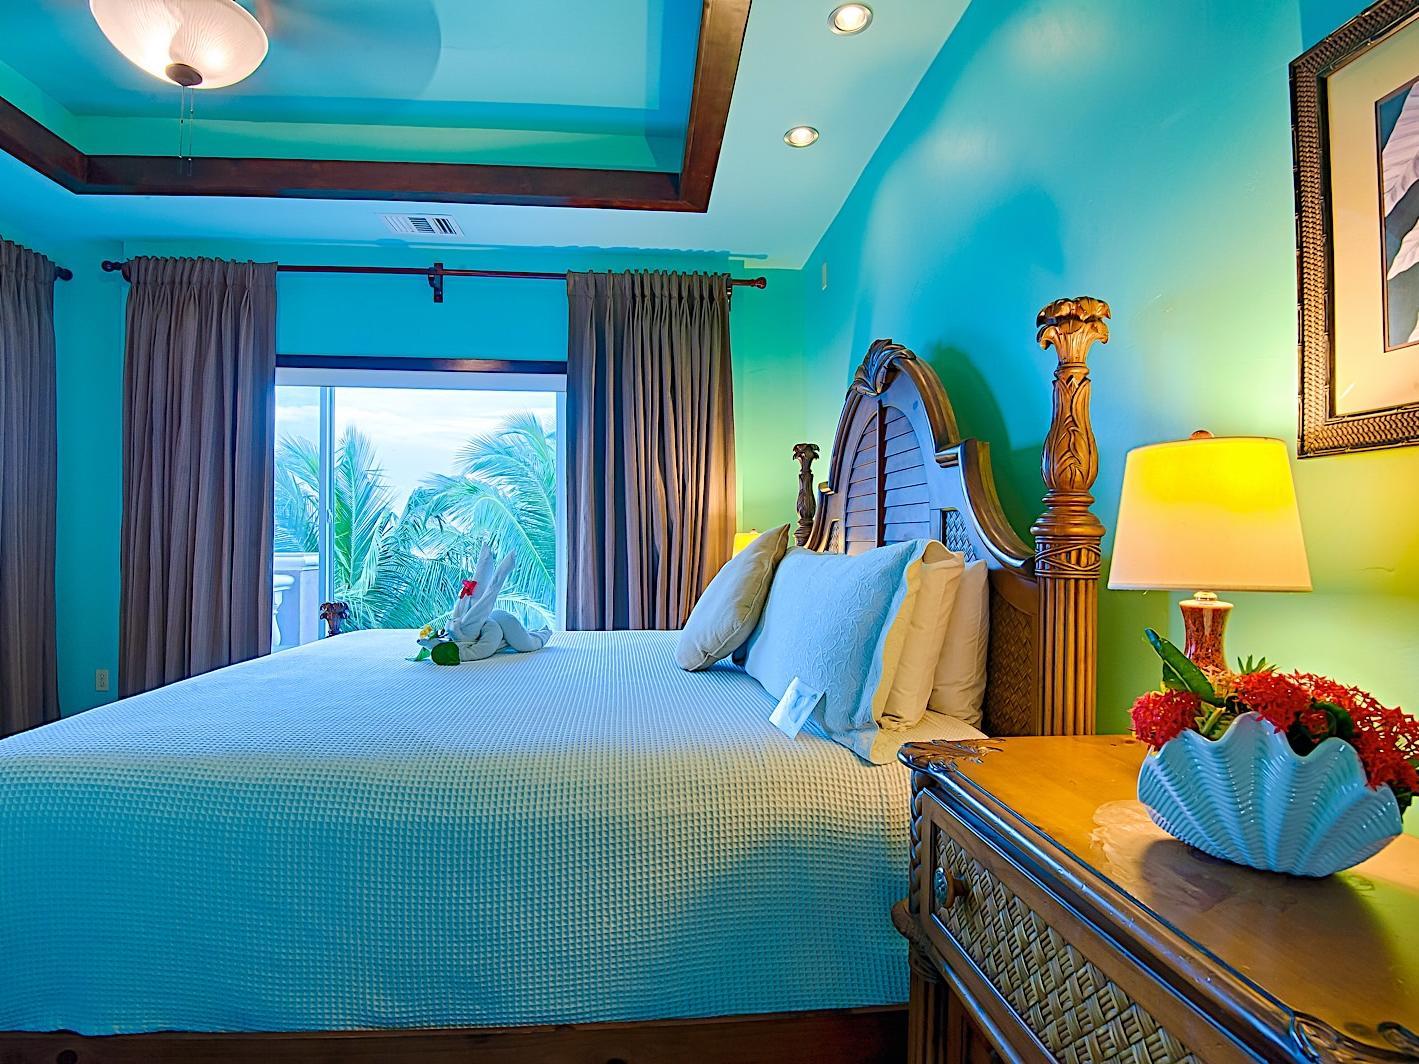 oom with bed, nightstand and door to balcony